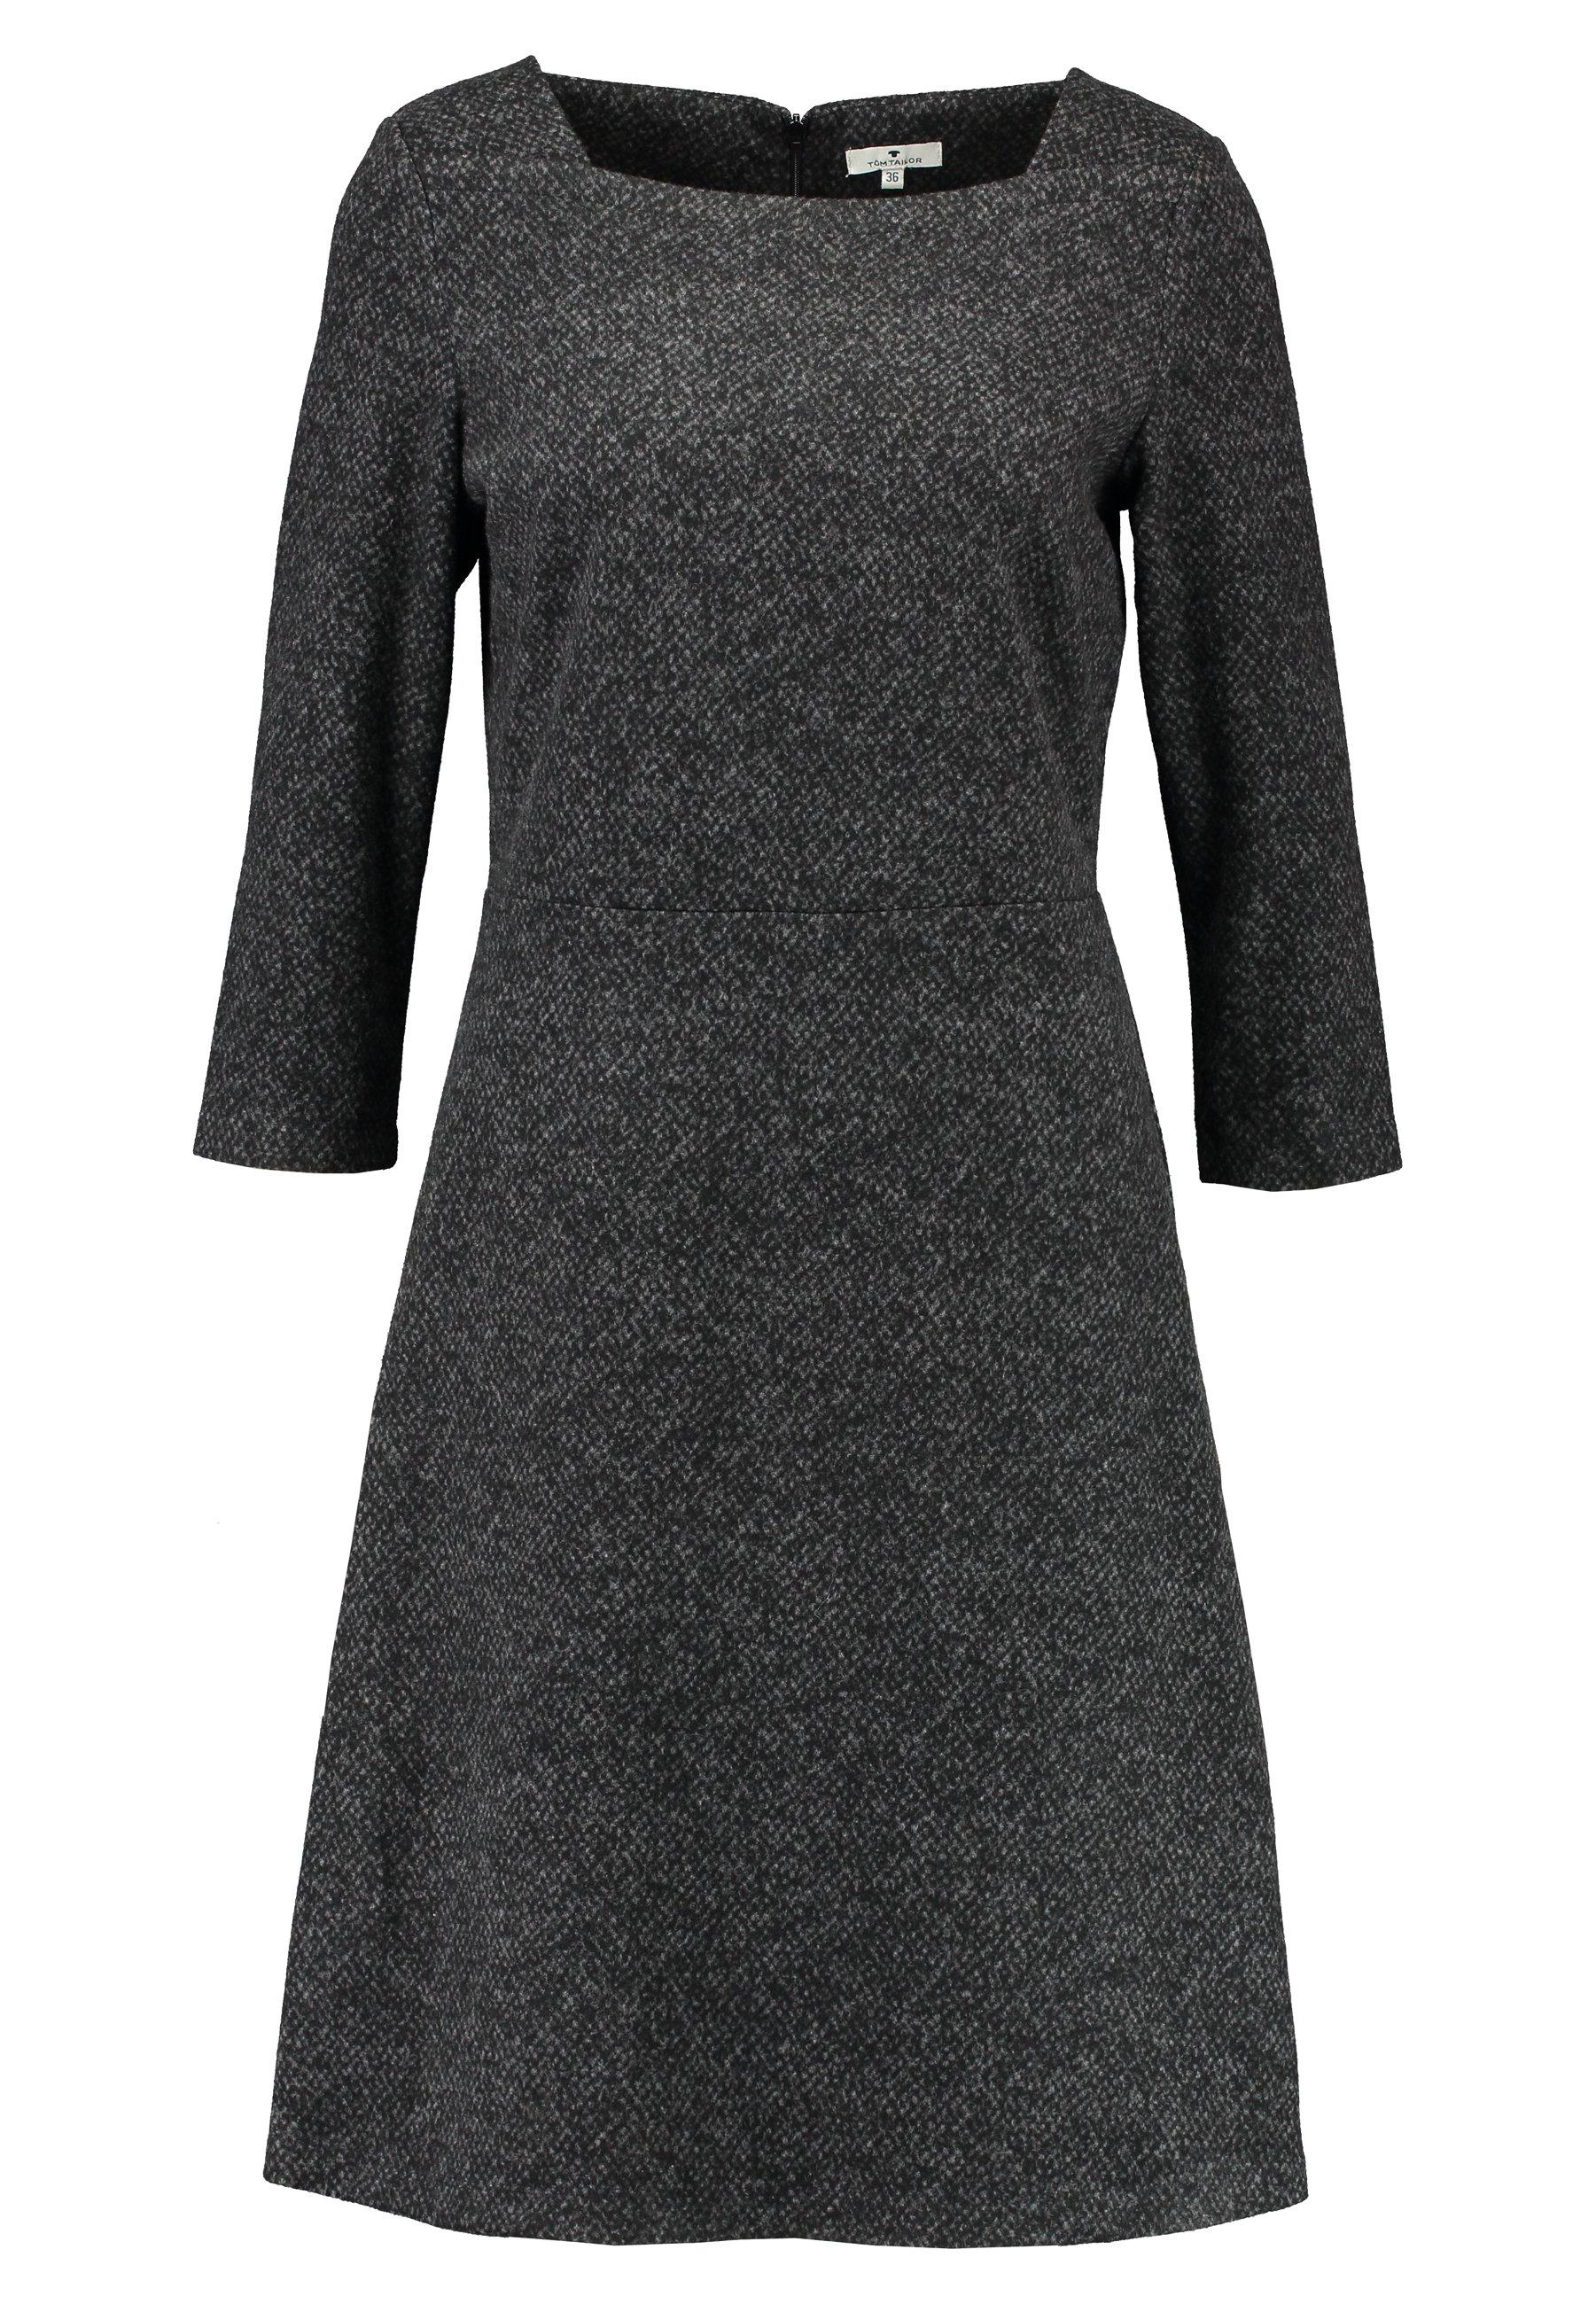 TOM TAILOR DRESS A-SHAPE SALT AND PEPPER - Tubino - grey black 1uBPDJM9